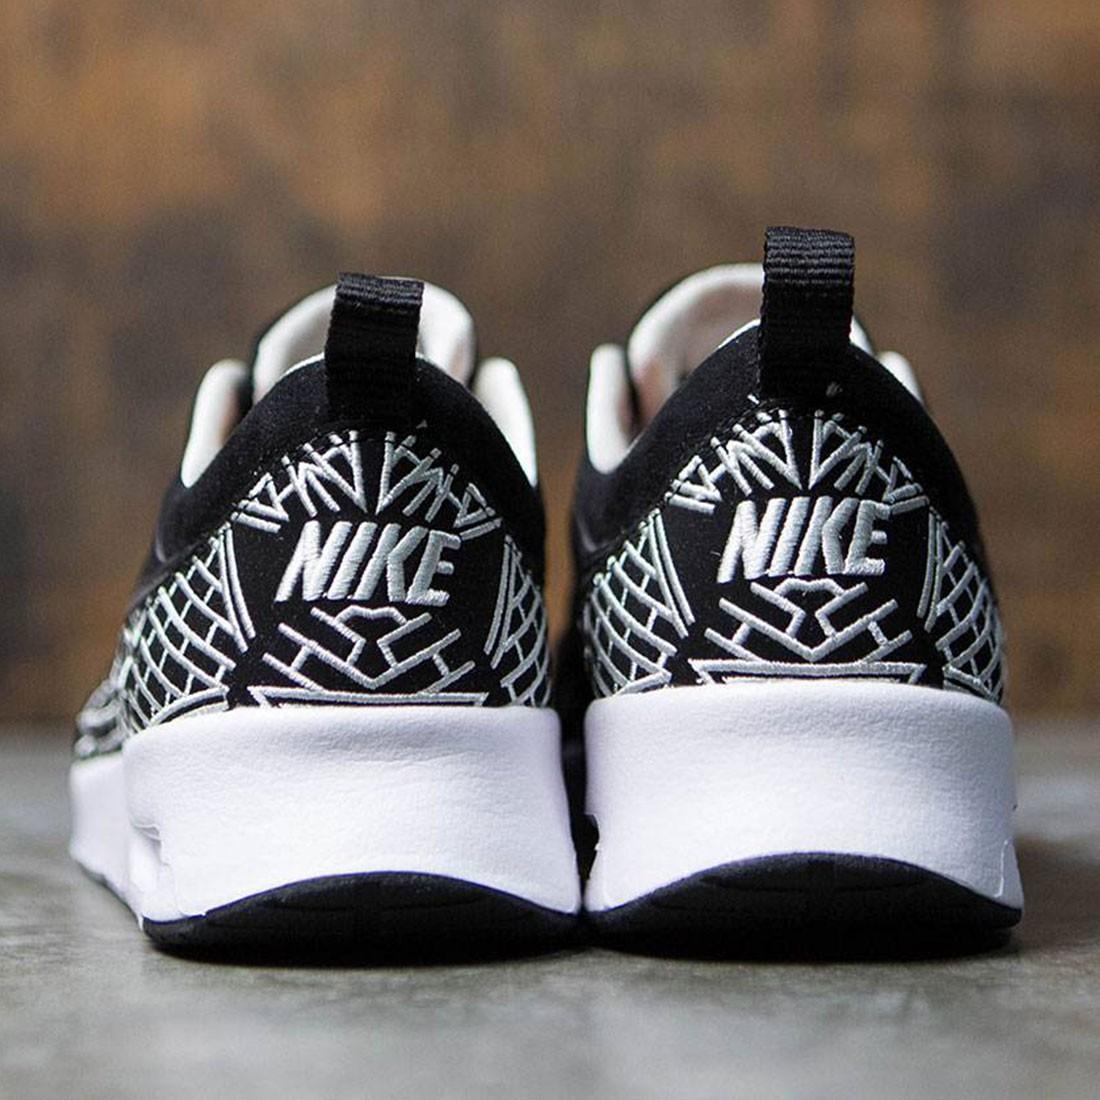 4c026bcd3a Nike Women Wmns Nike Air Max Thea Lotc Qs Nyc (black / white / light bone /  black)